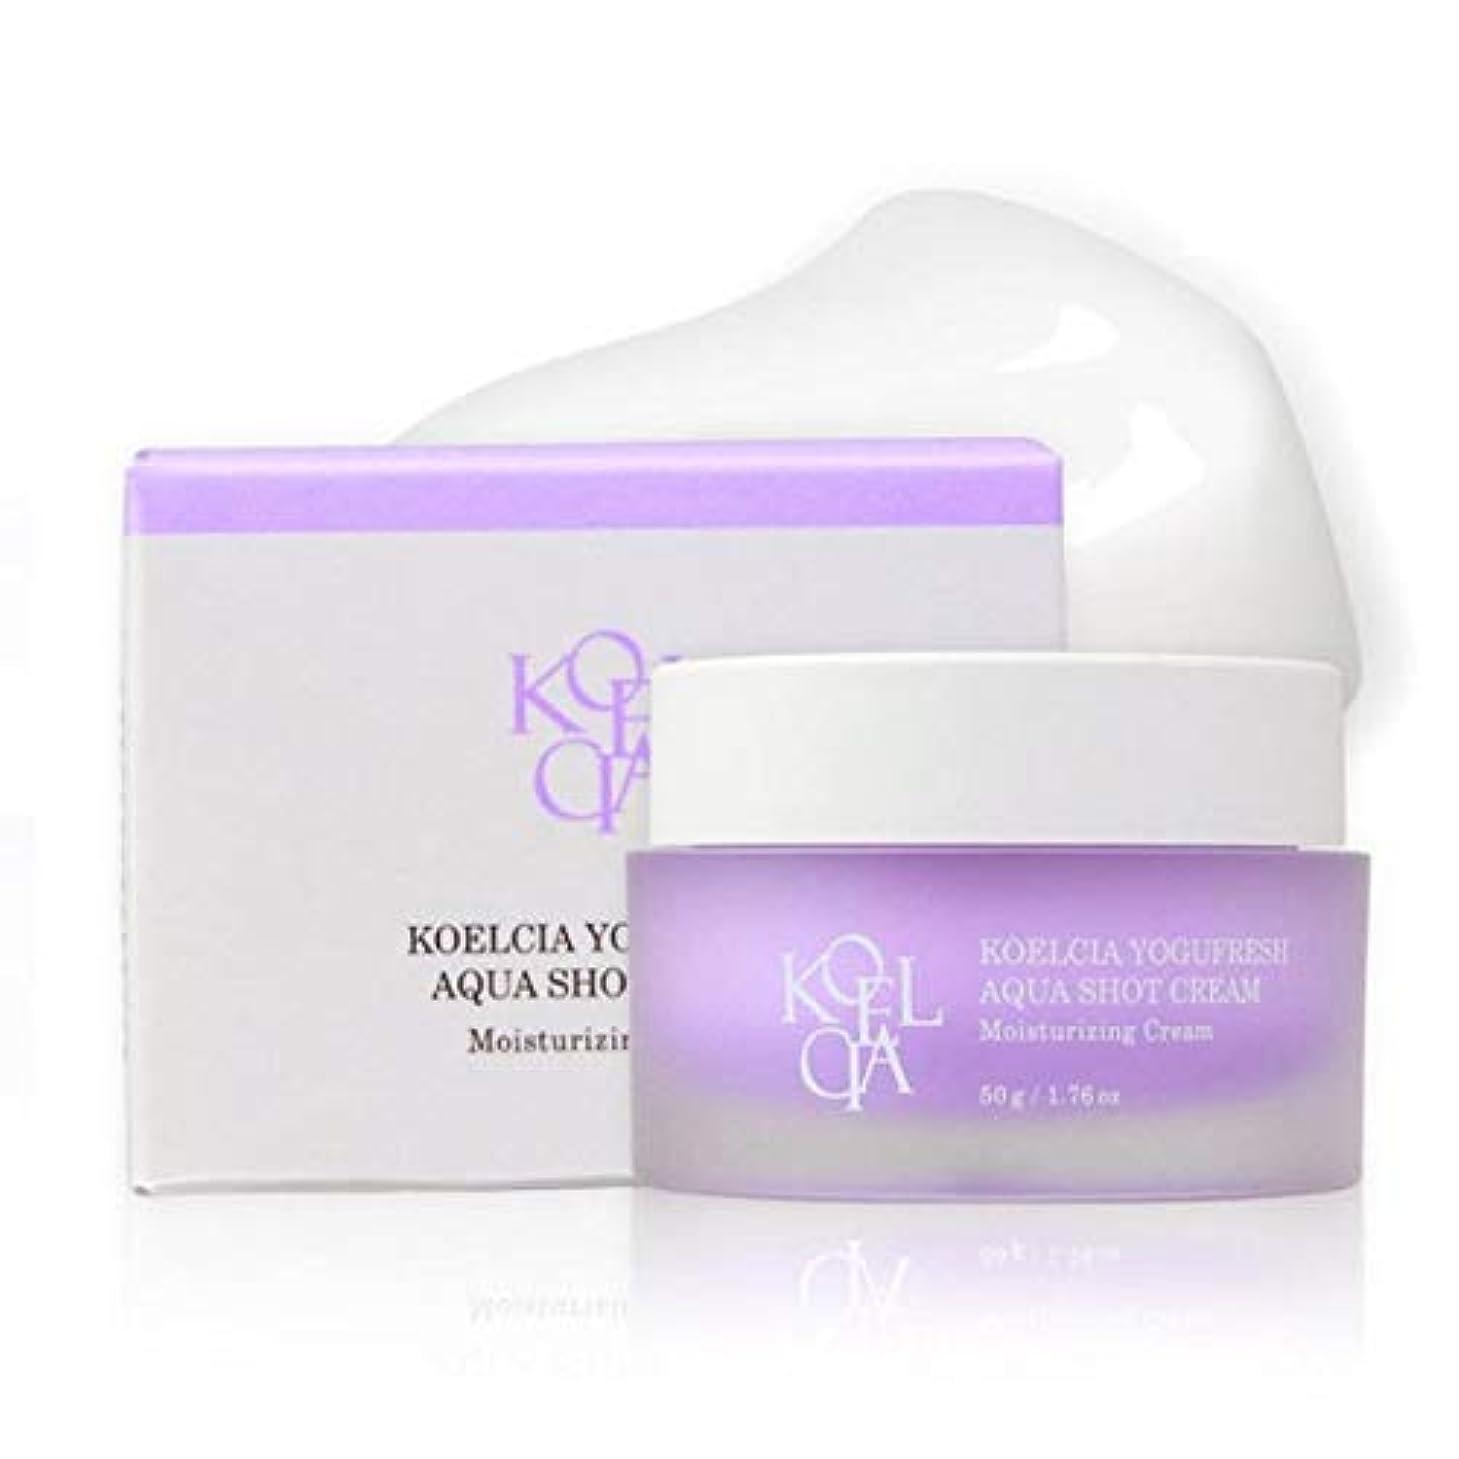 KOELCIA YOGUFRESH AQUA SHOT CREAM 50g/Hot K-Beauty Best Moisture Cream/Korea Cosmetics [並行輸入品]